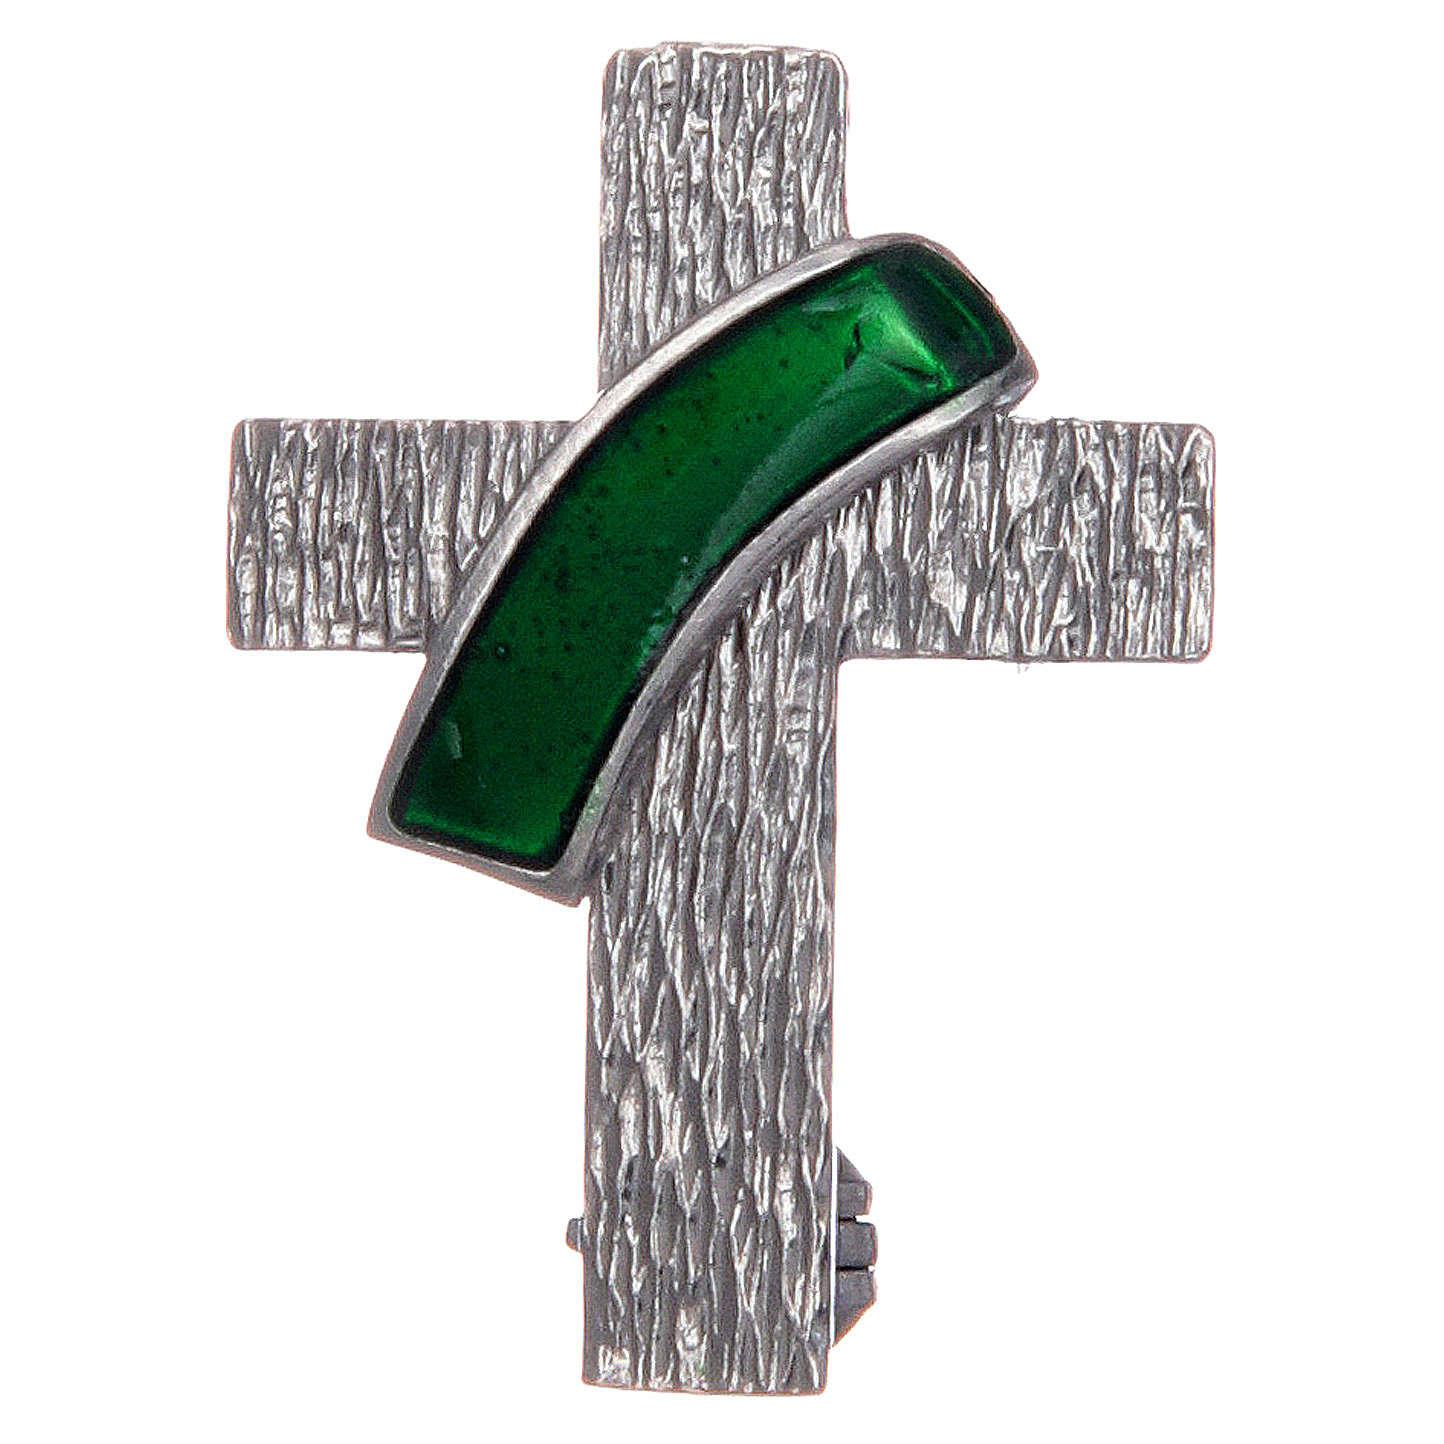 Broche cruz diaconal prata 925 esmalte verde 4